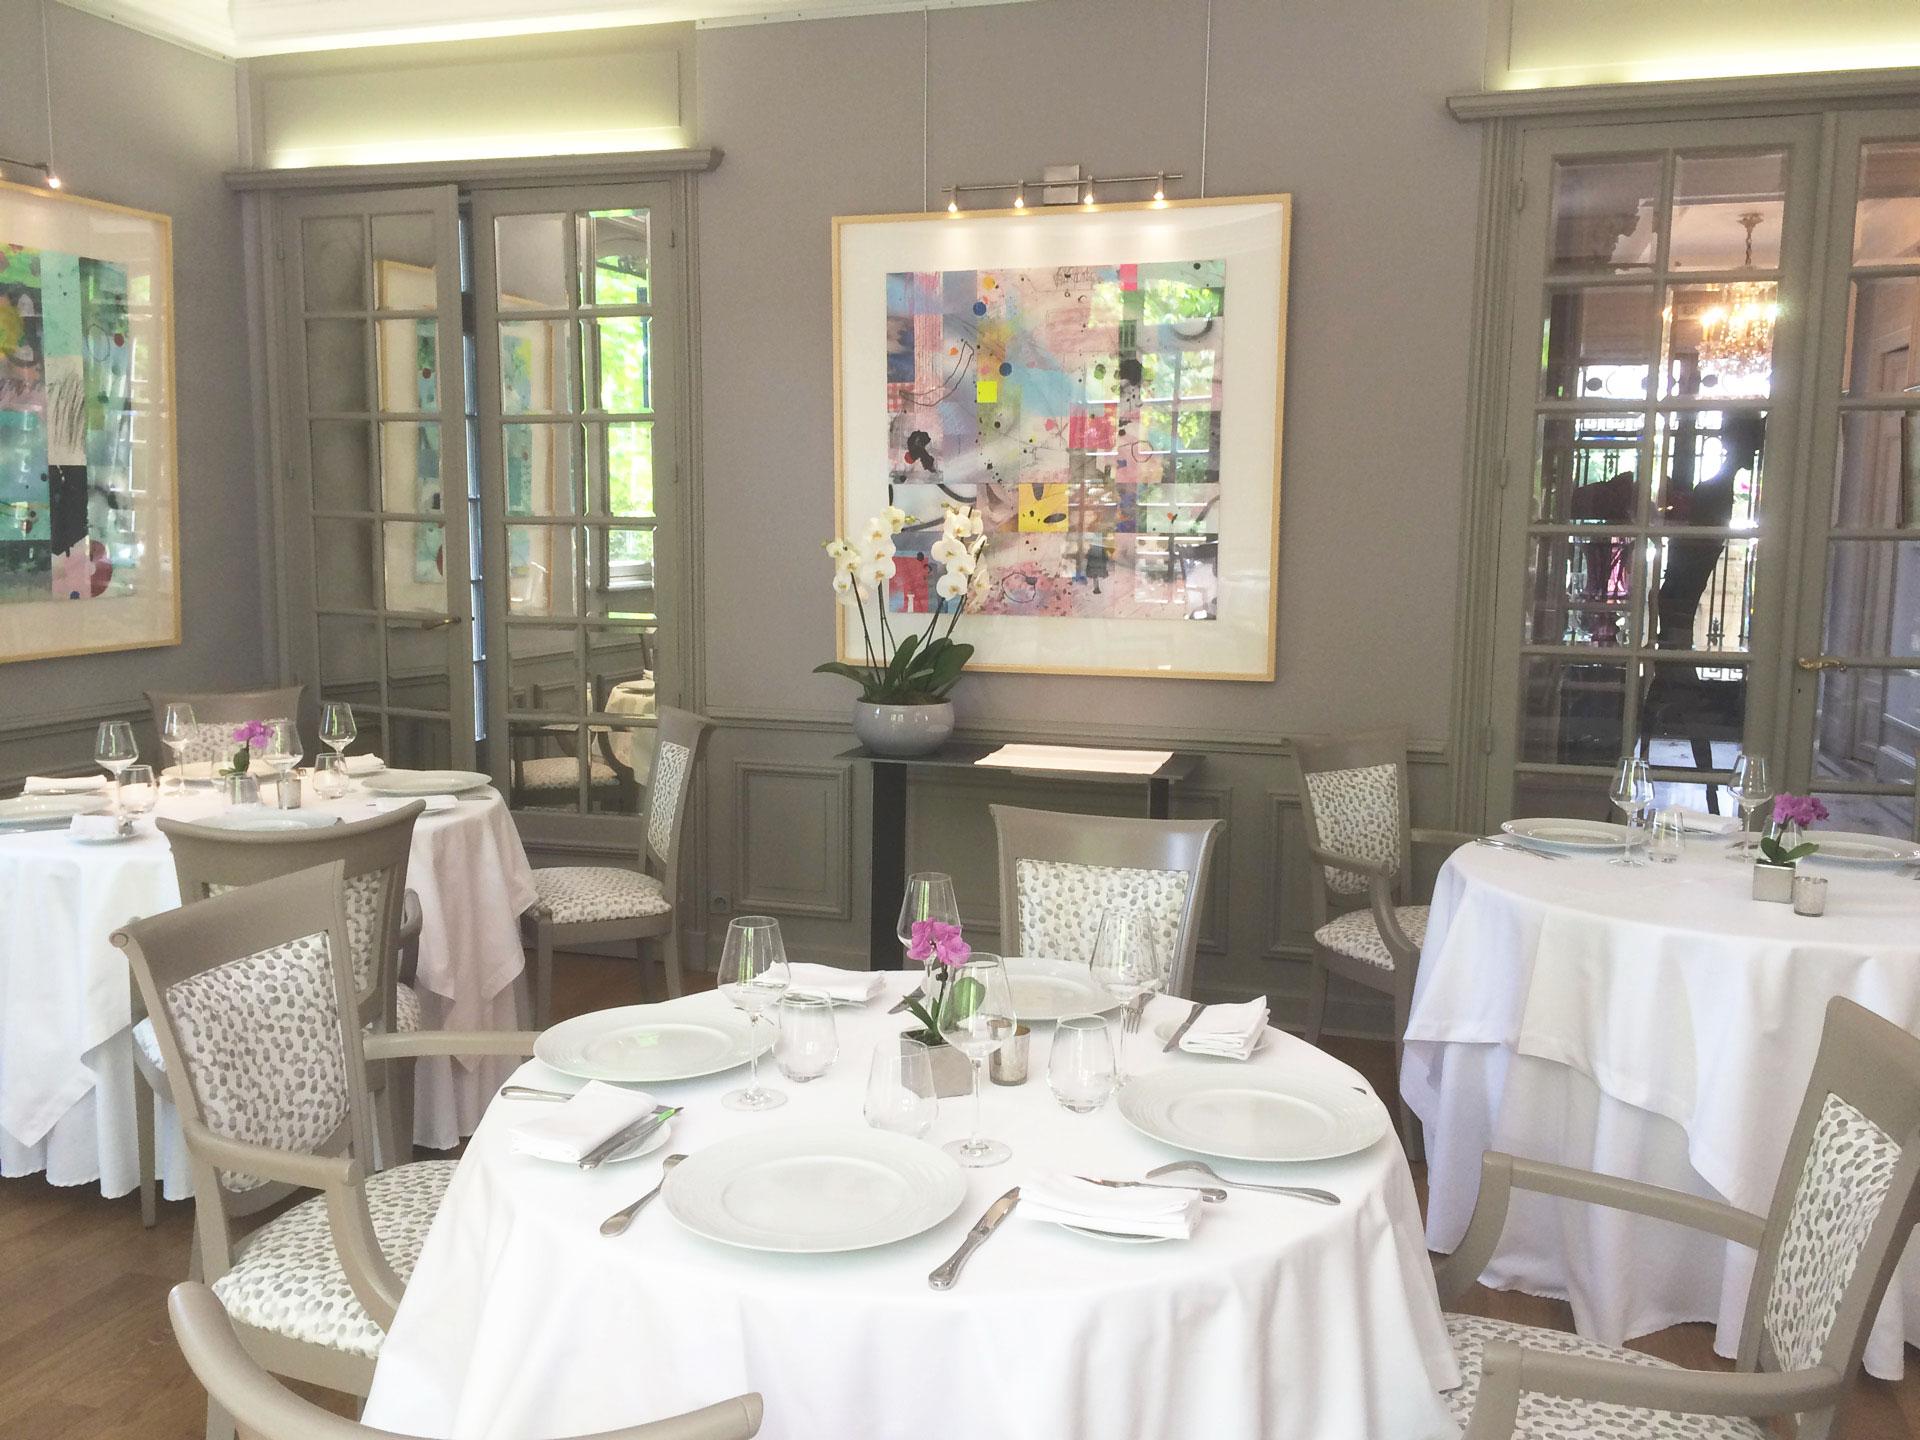 Restaurant Le Cosy Maisons Laffitte Stunning Restaurant